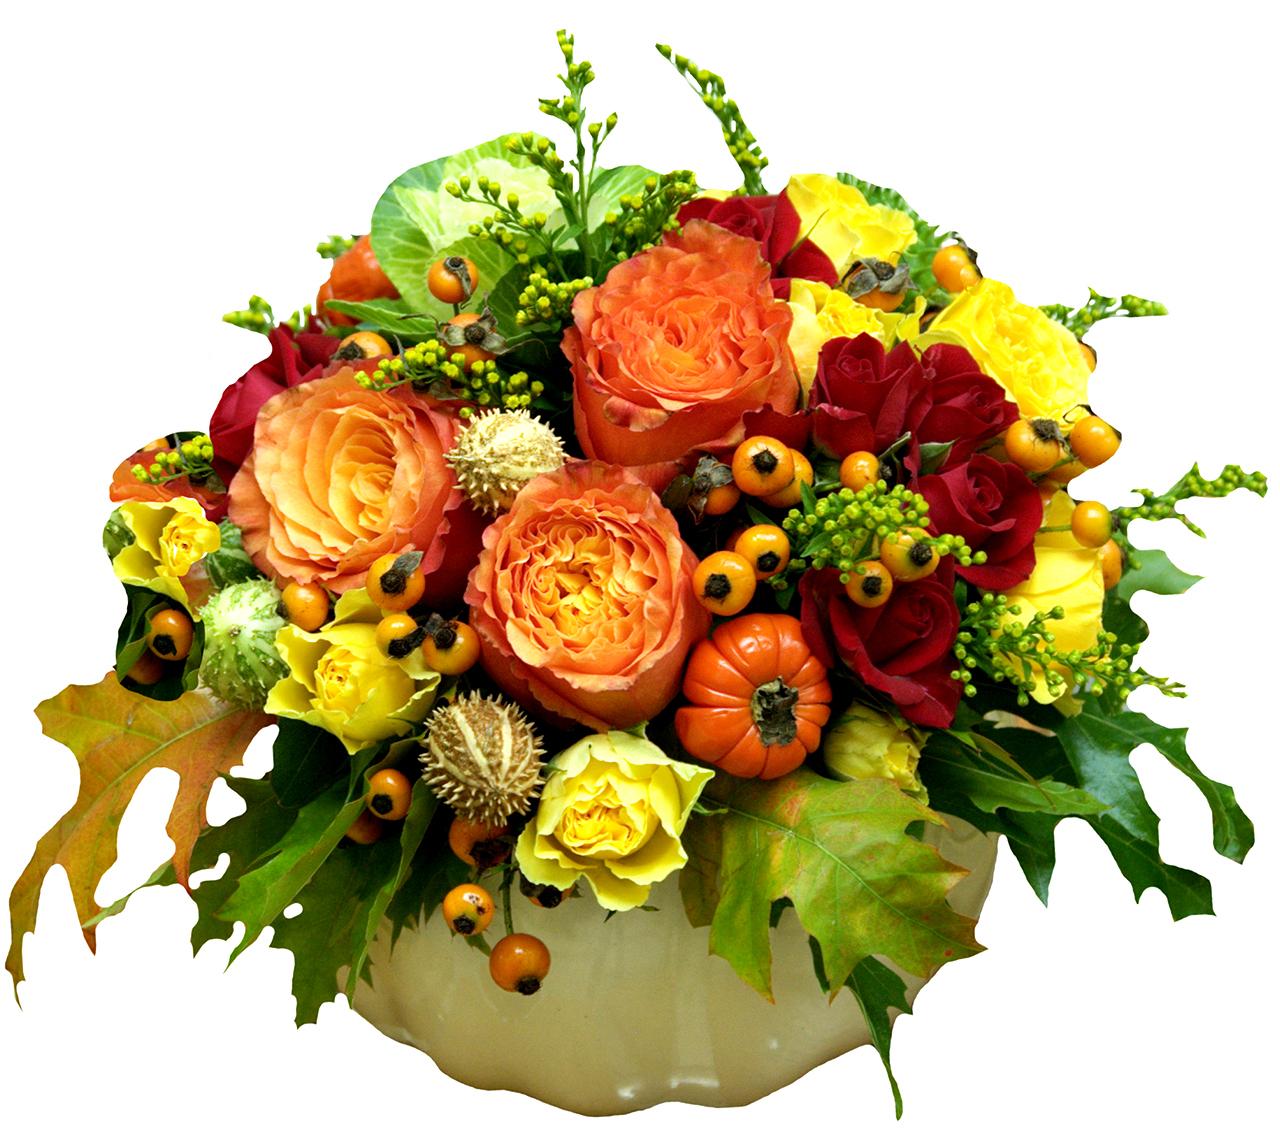 Colectia Flori de Toamna